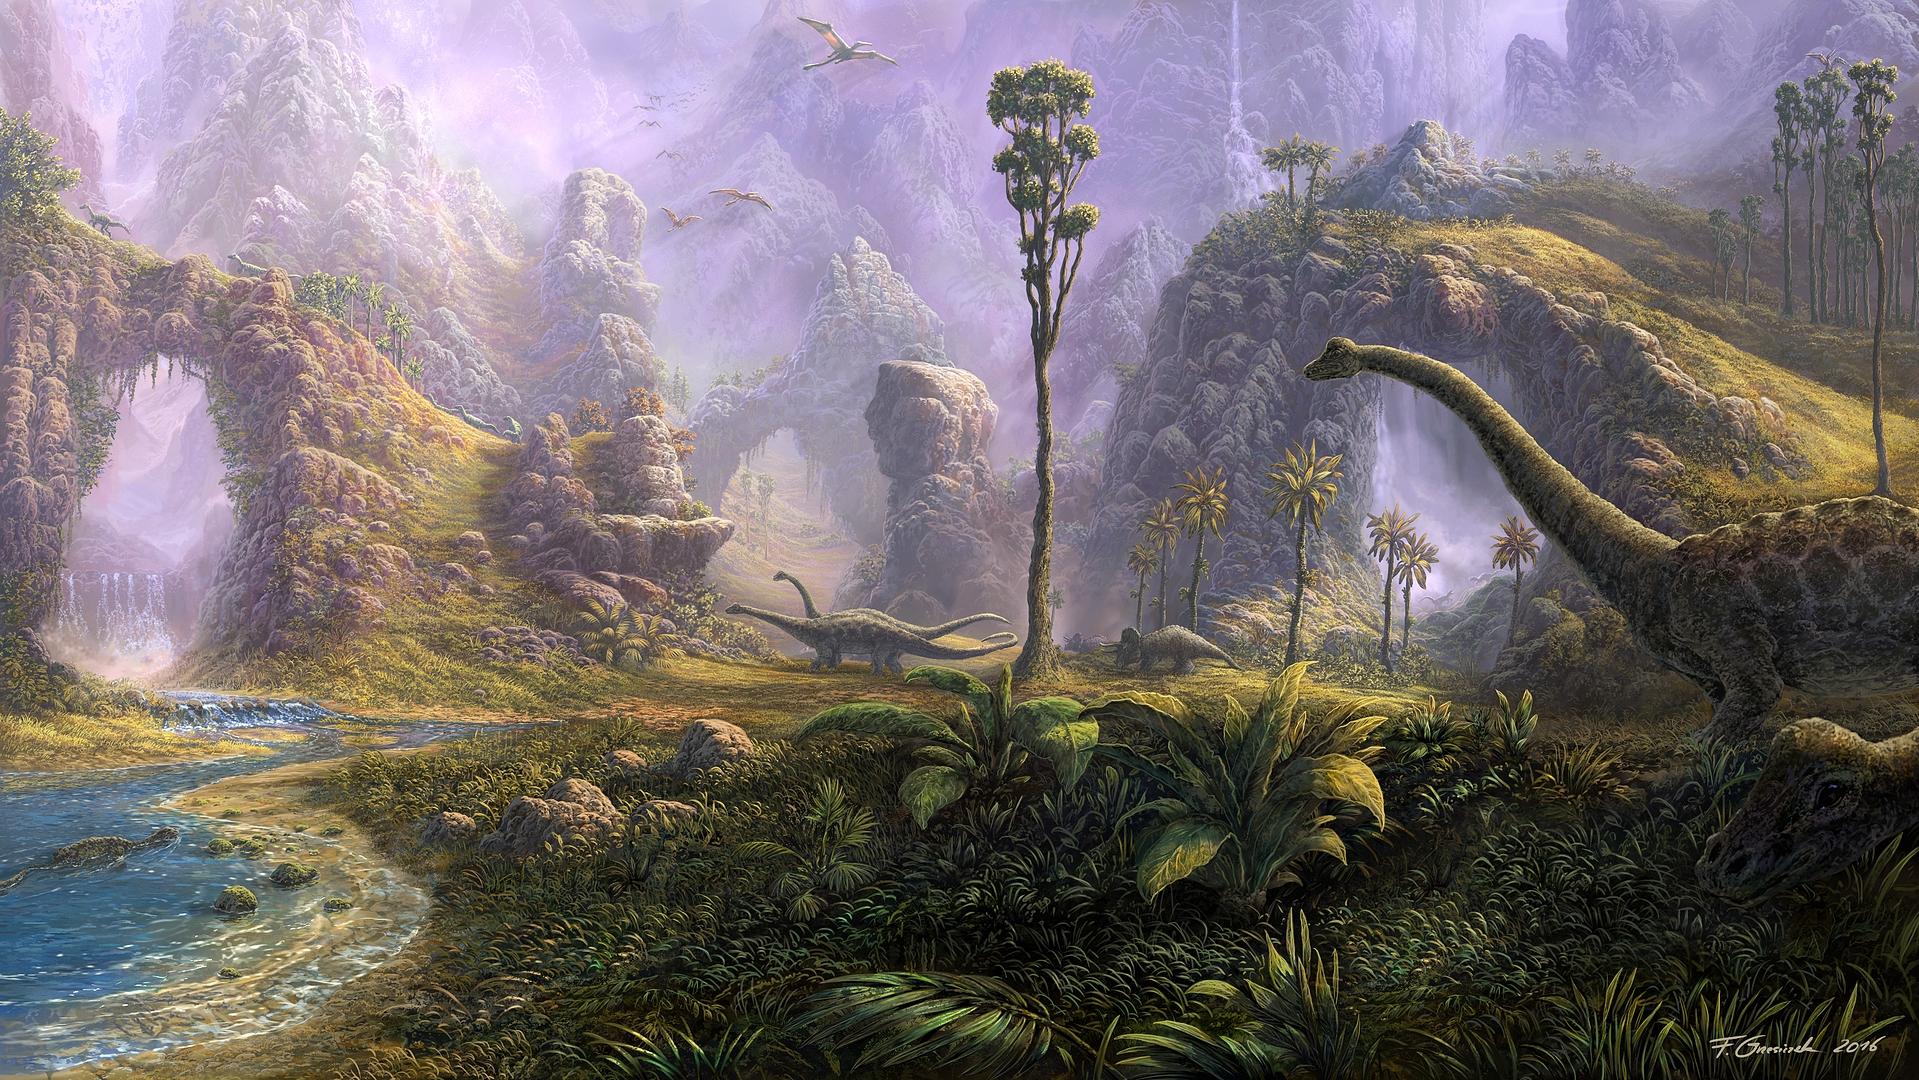 dinosaur landscape background - photo #6